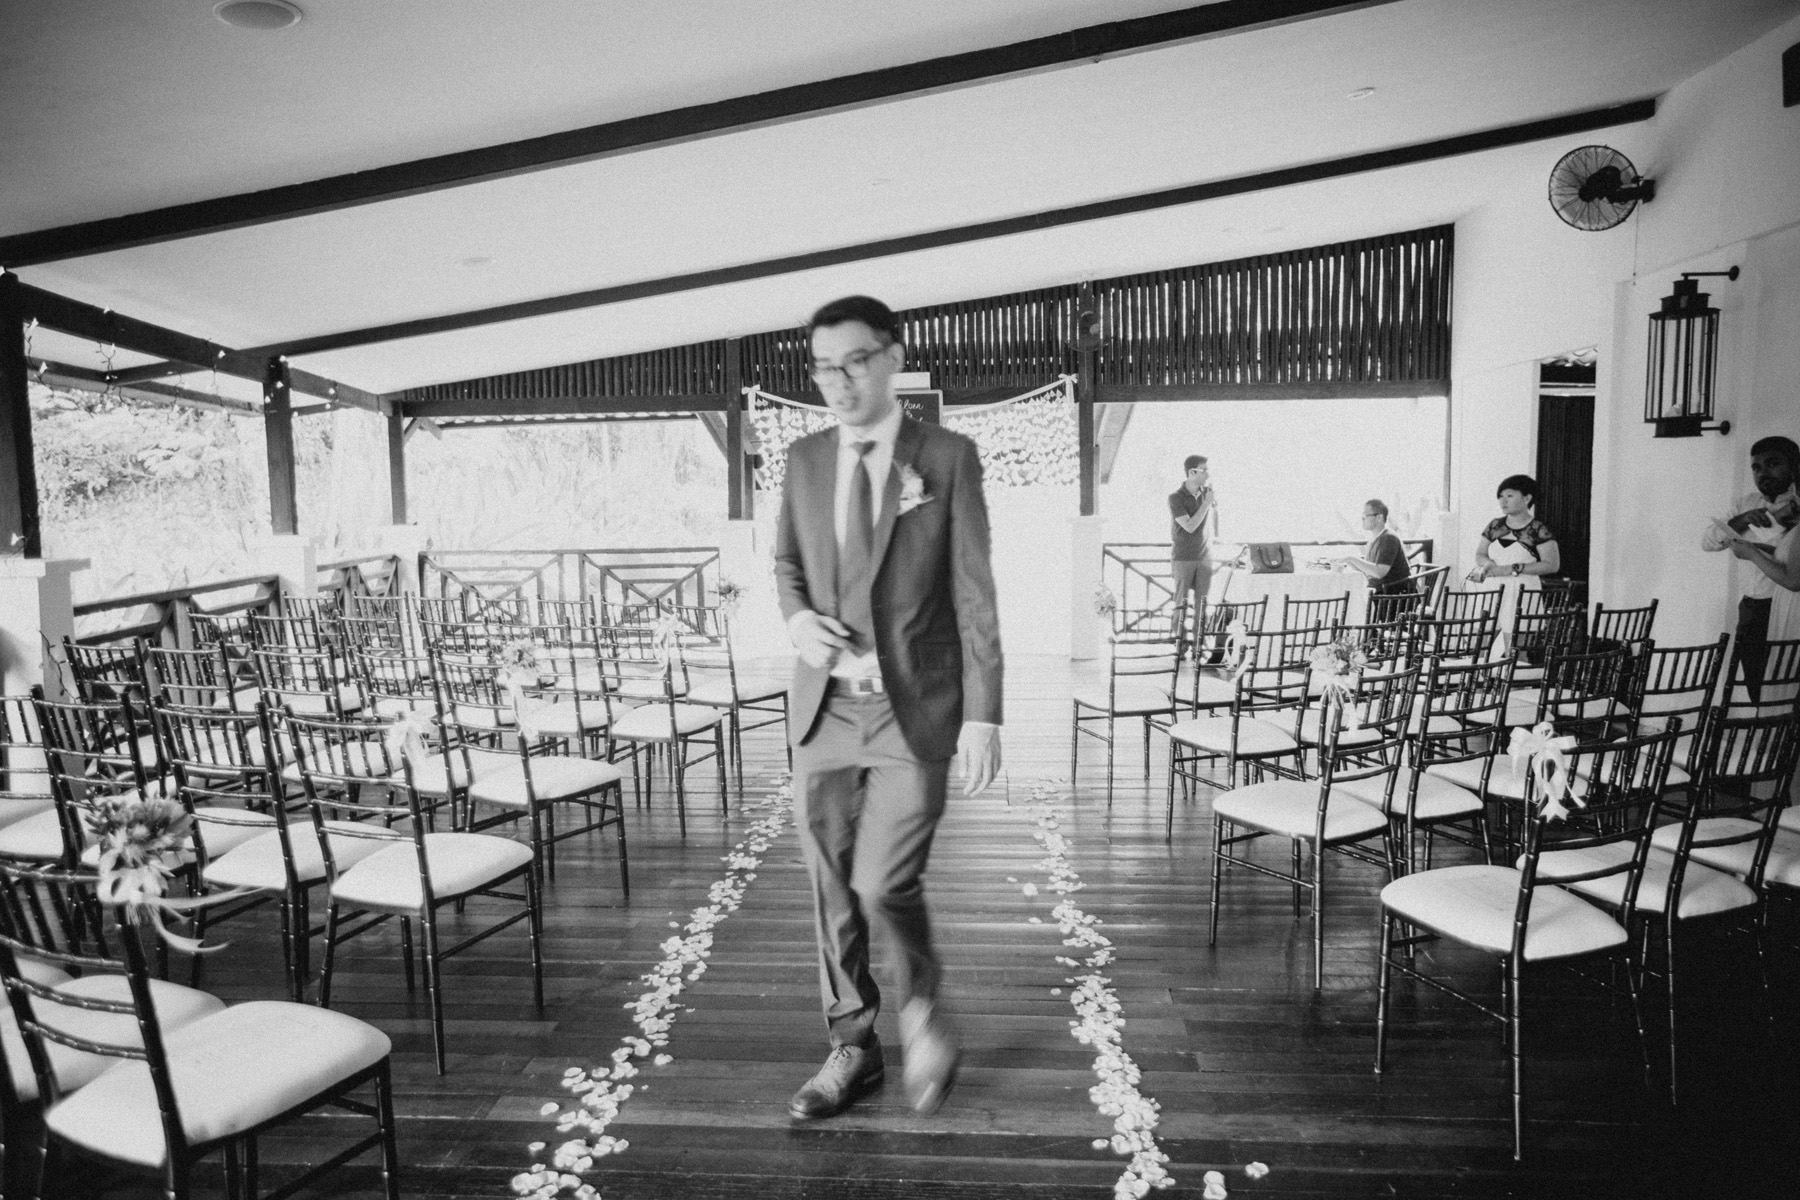 singapore-wedding-travel-photographer-faith-alvin-wedding-wmt-25.jpg